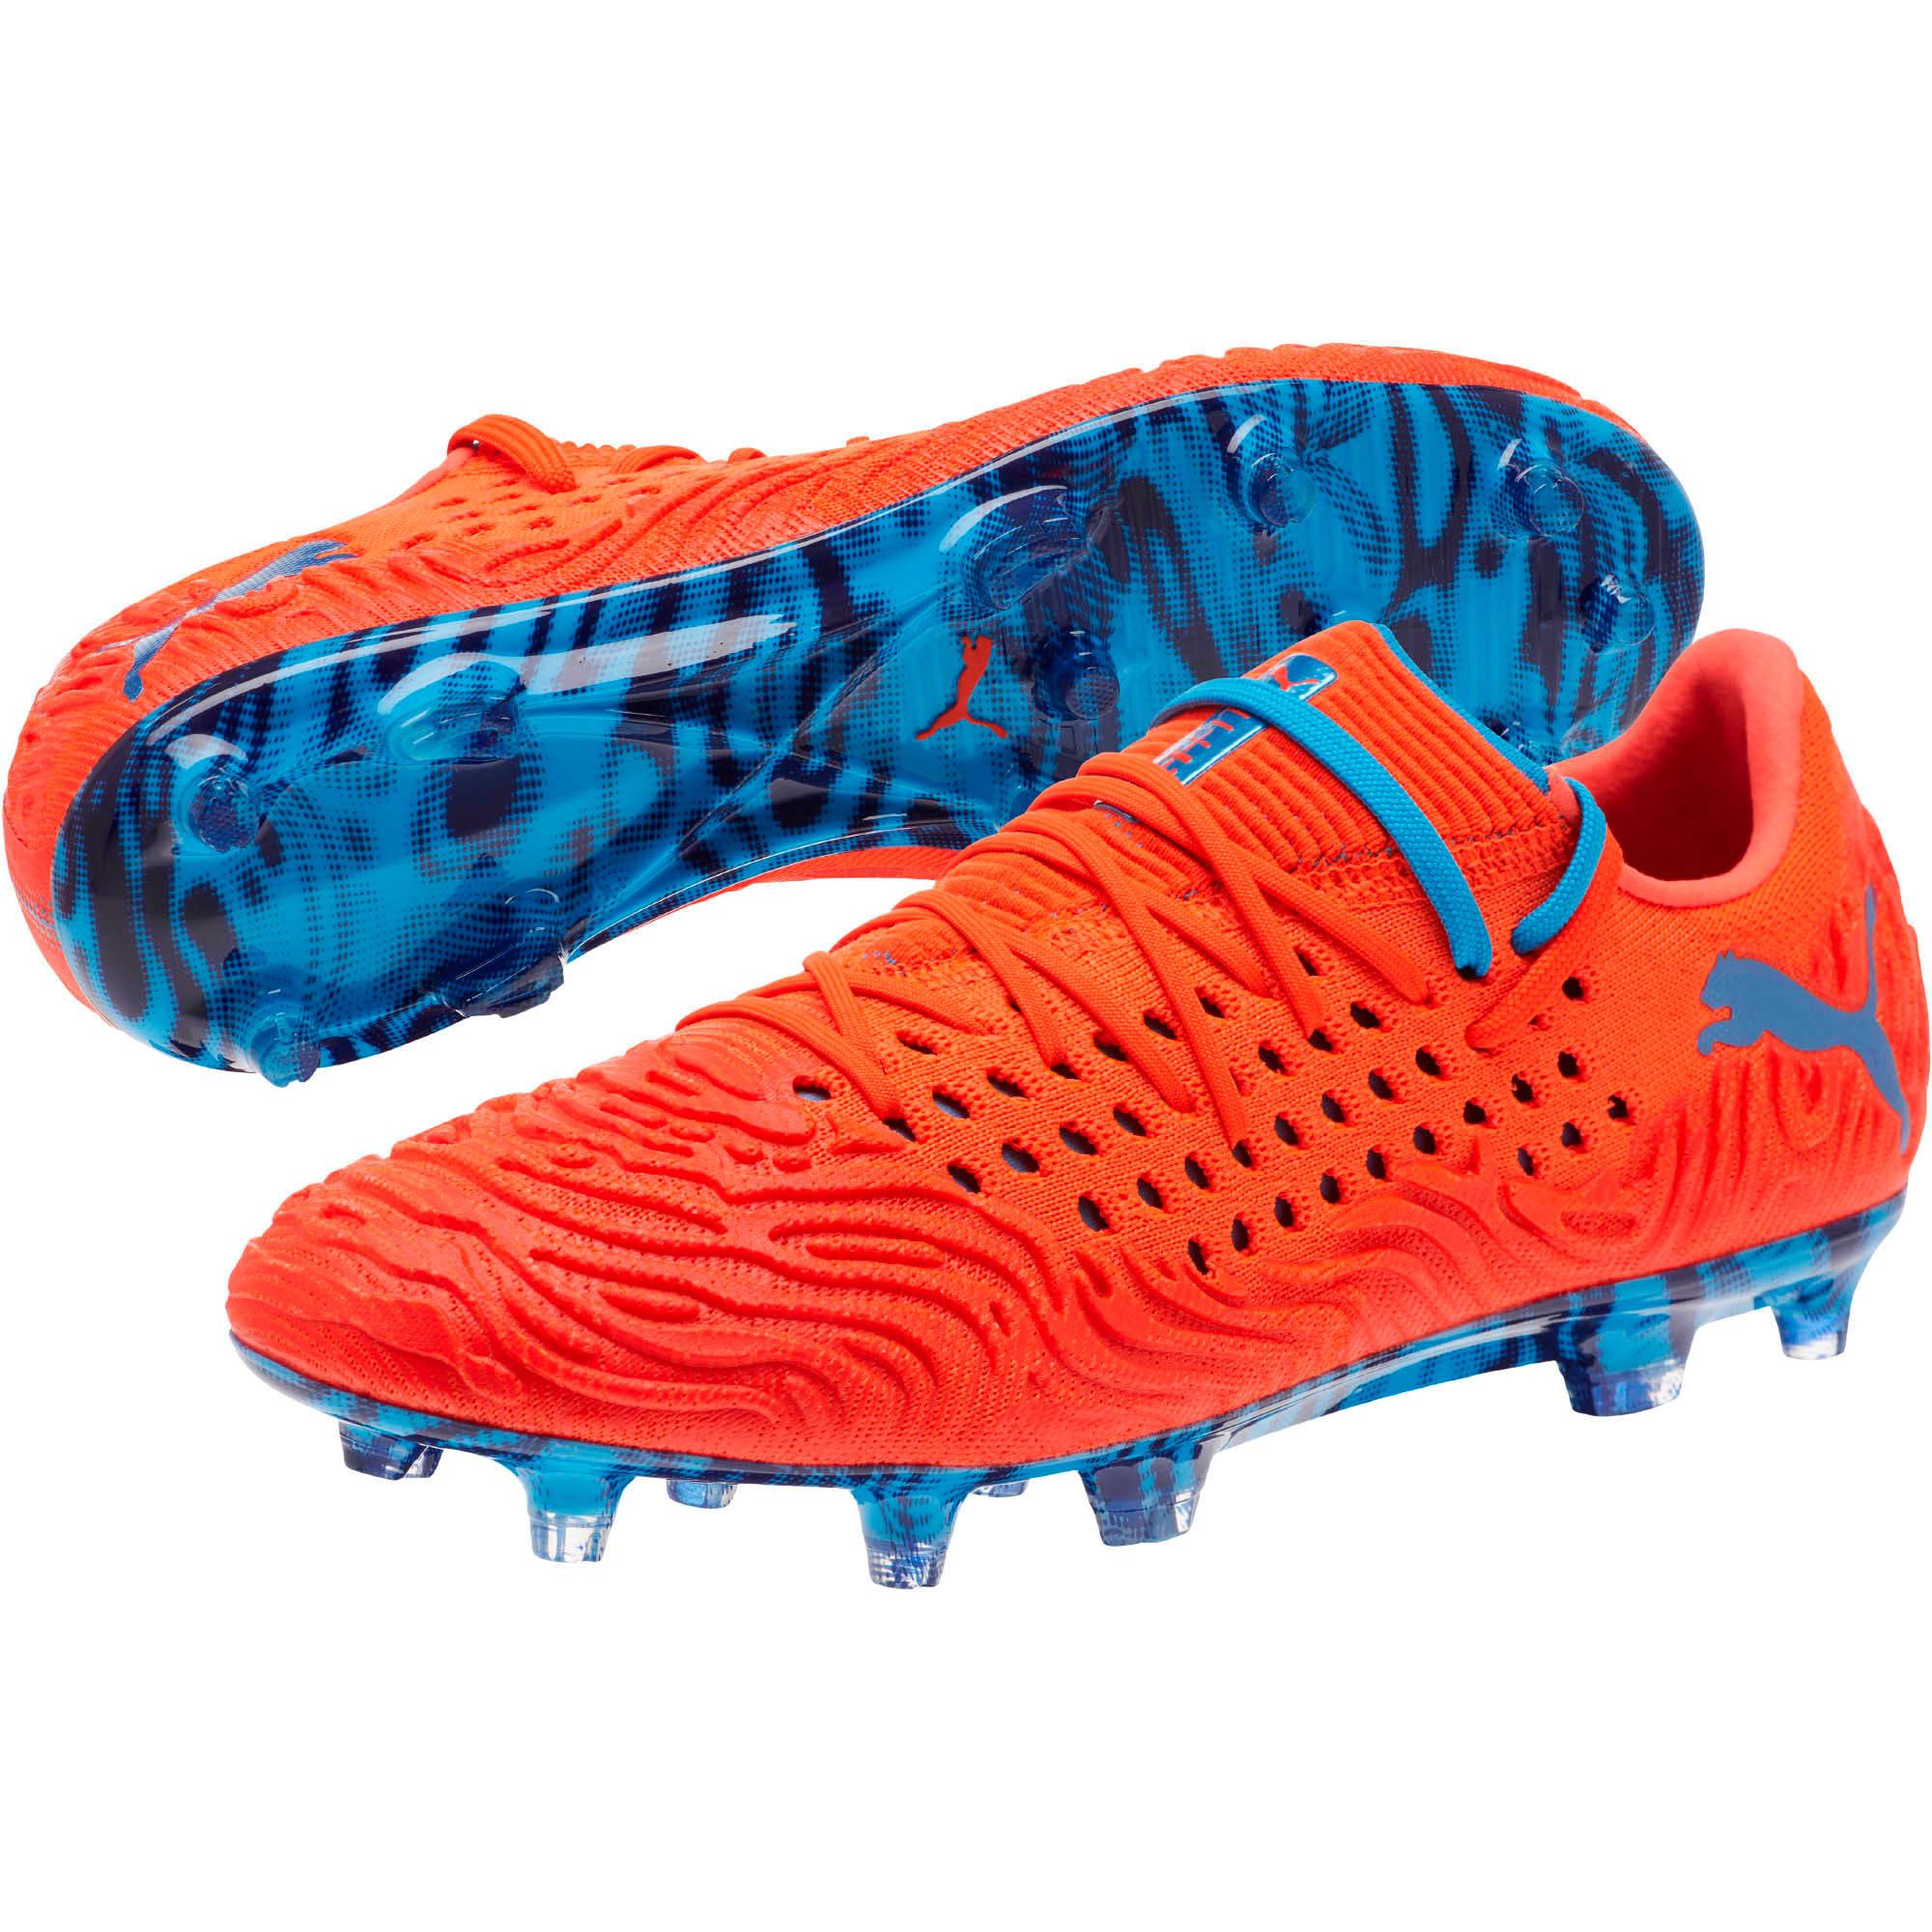 Thumbnail 2 of FUTURE 19.1 NETFIT Lo FG/AG Men's Soccer Cleats, Red Blast-Bleu Azur, medium